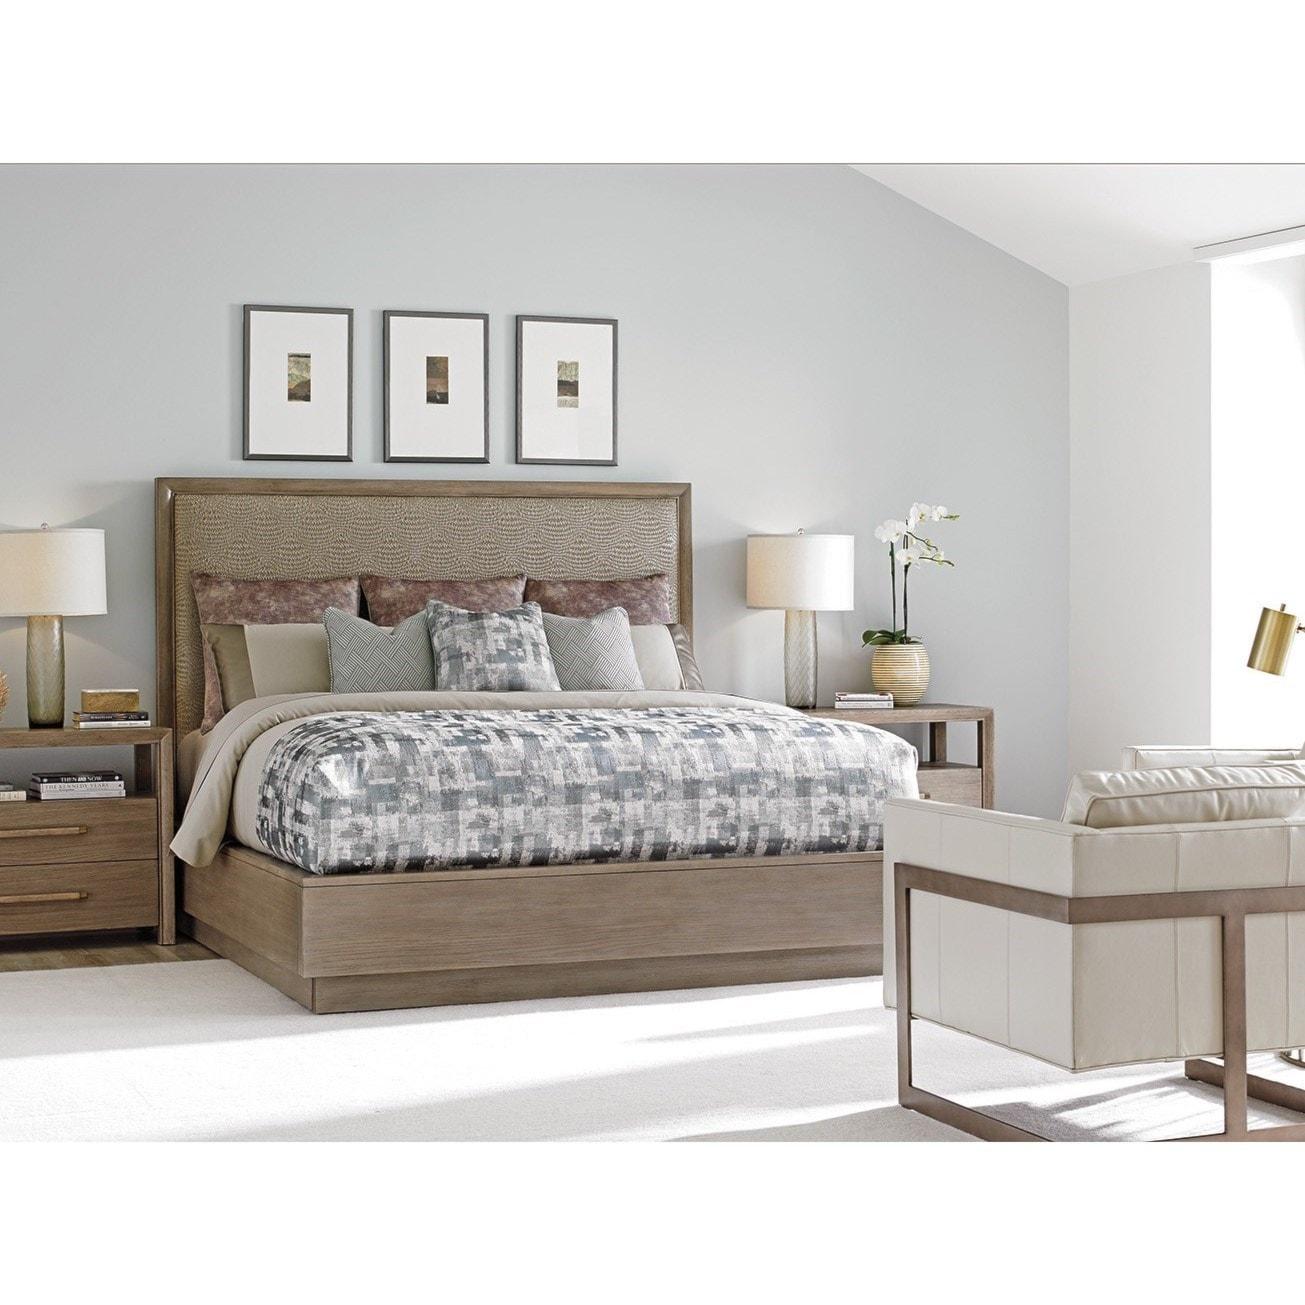 sophisticated lexington bedroom furniture. Lexington Shadow PlayUptown Platform Bed 6/6 King Sophisticated Bedroom Furniture G